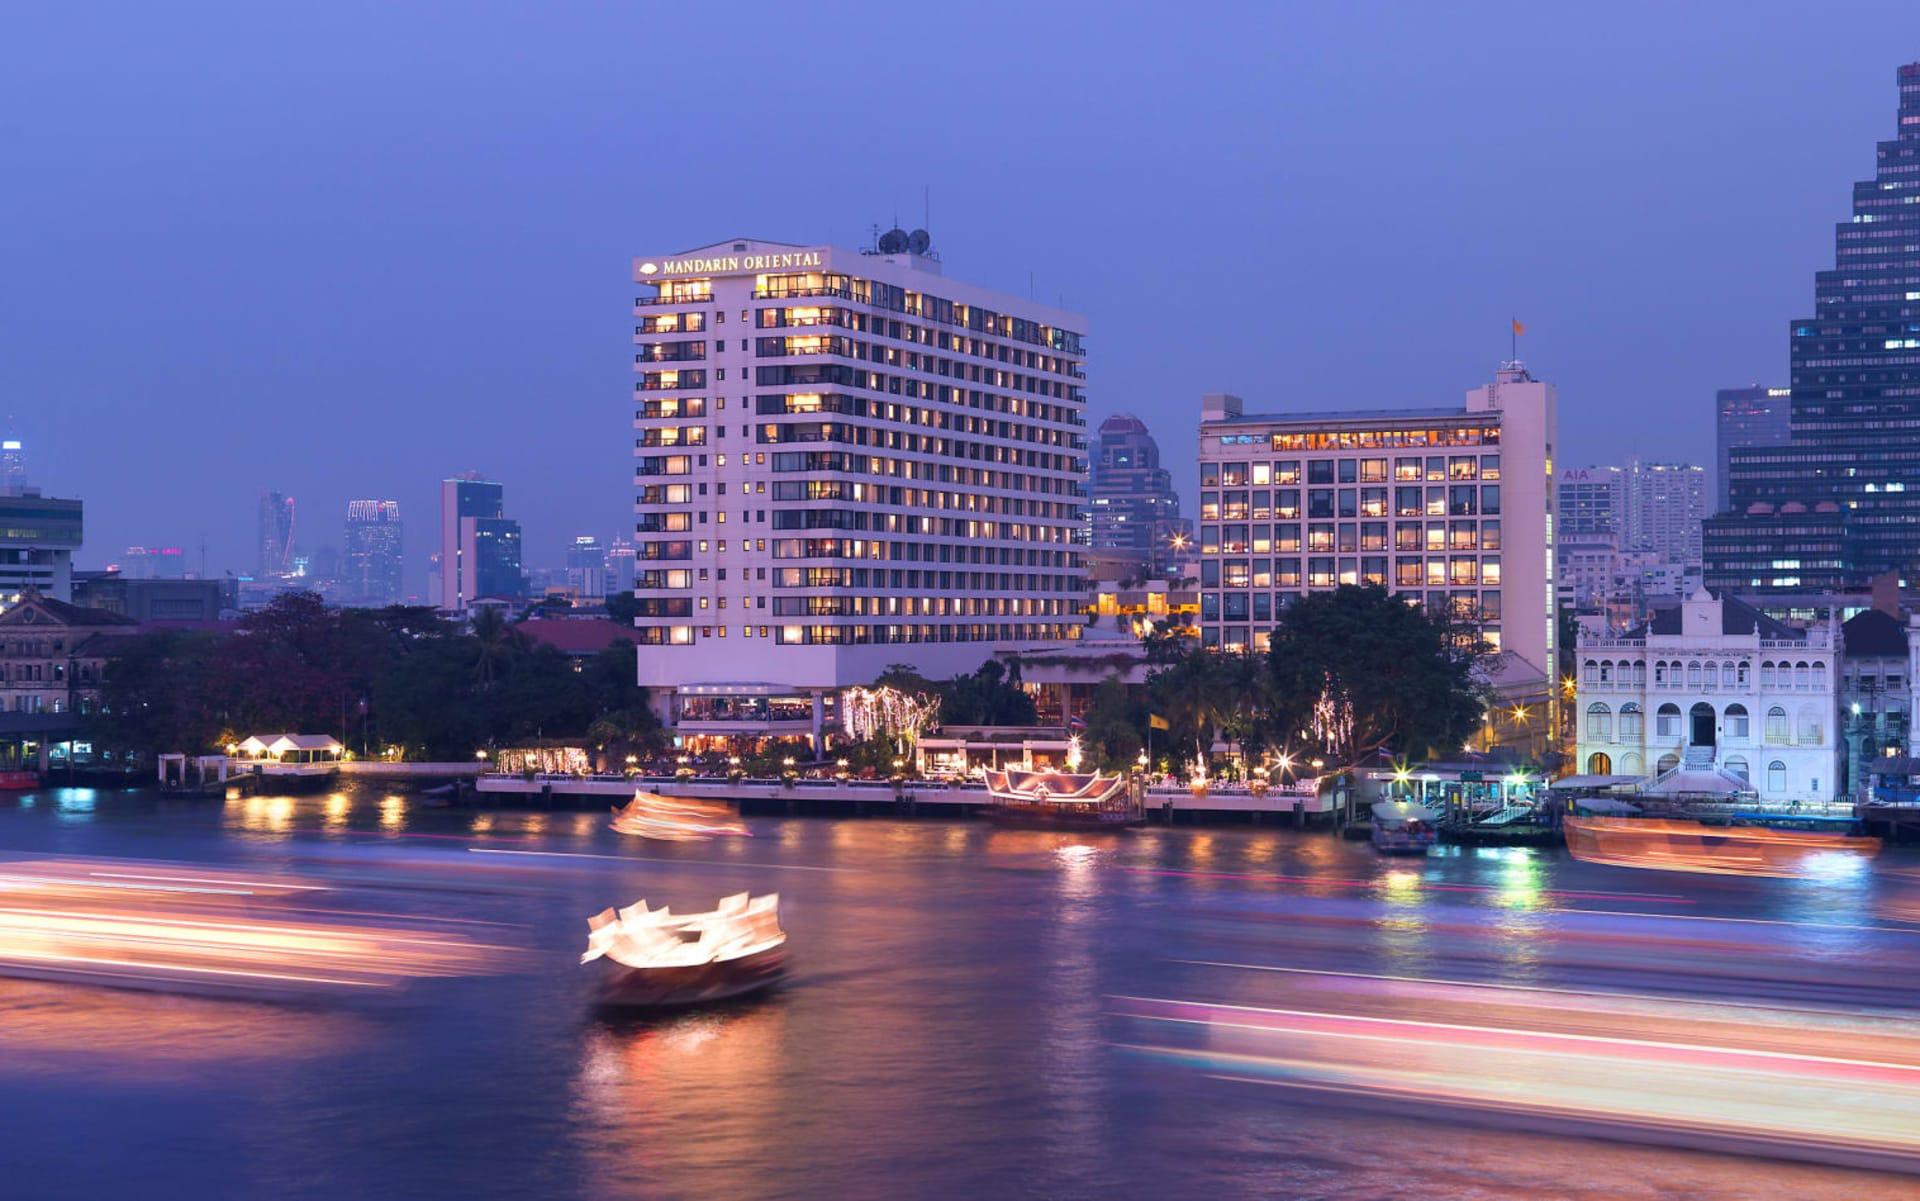 Mandarin Oriental in Bangkok: Exterior